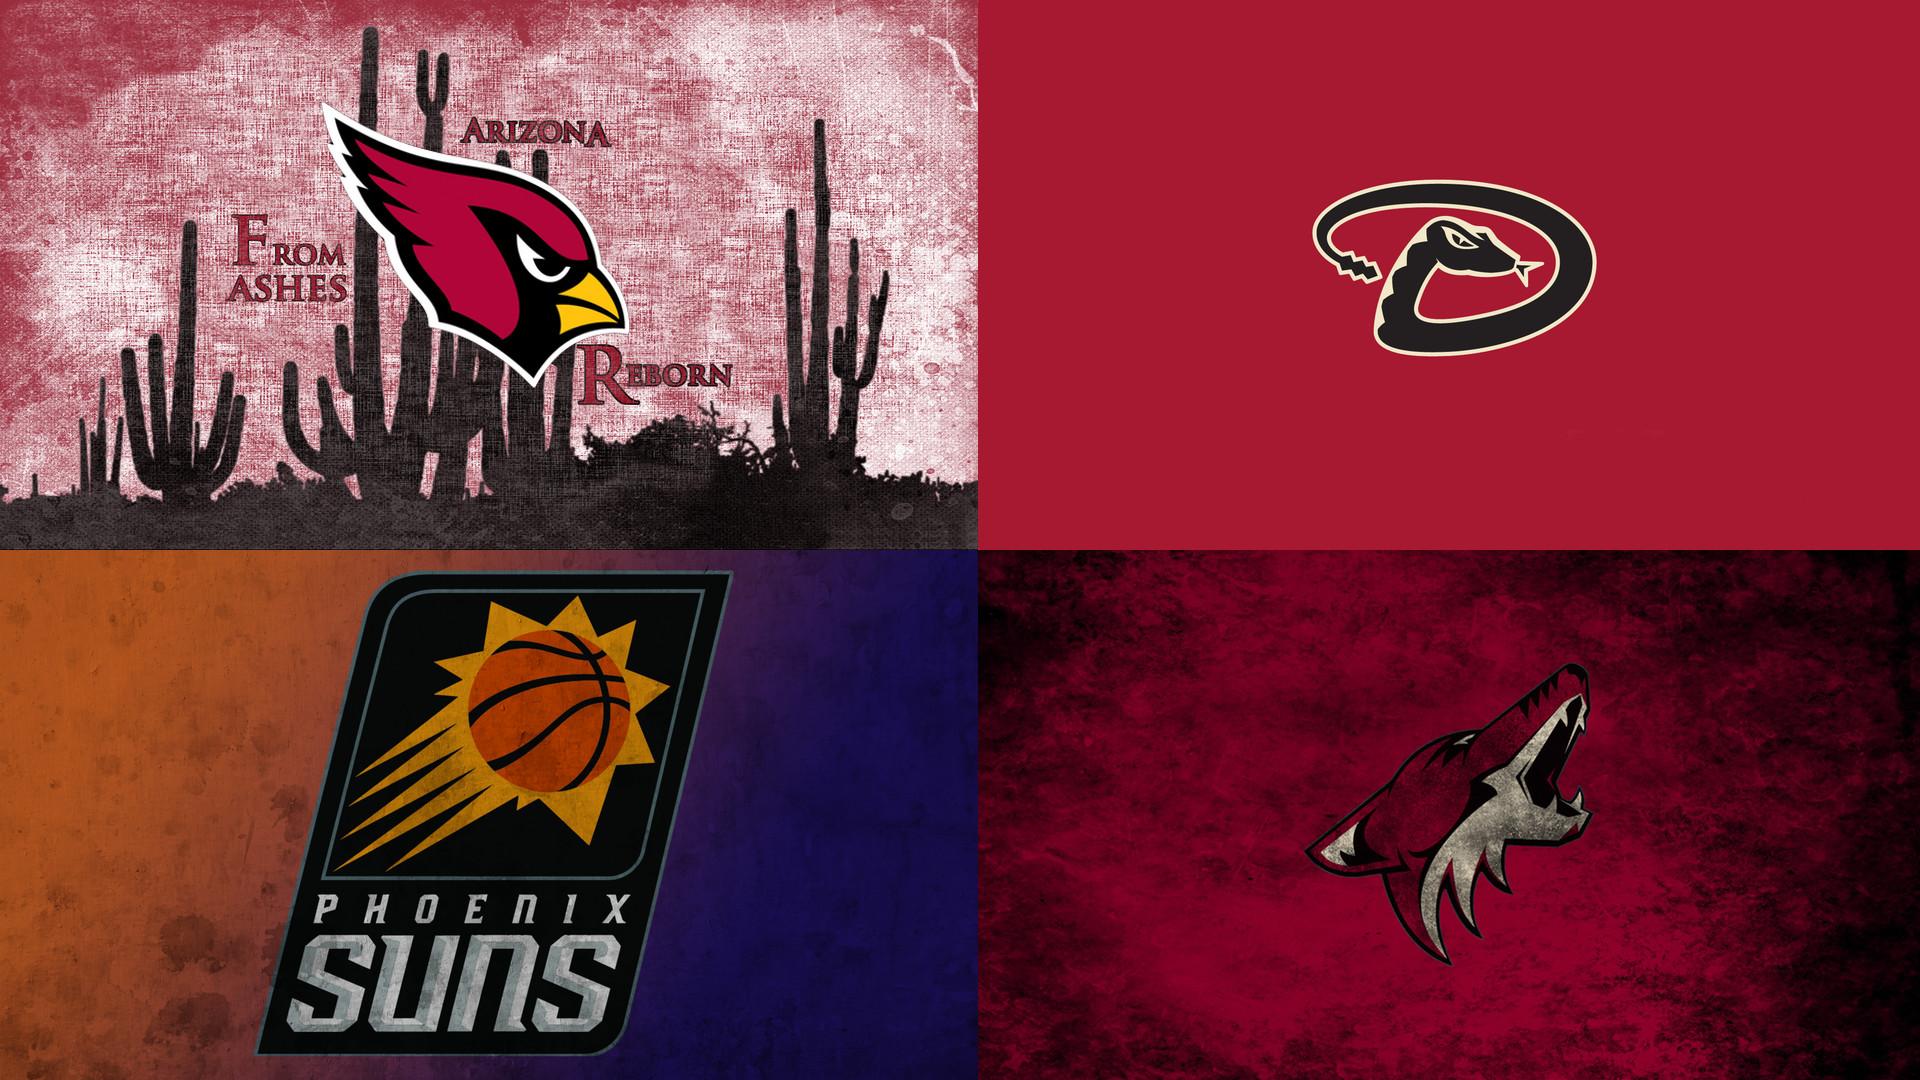 Arizona Iphone Wallpapers: Arizona State Wallpapers ·①